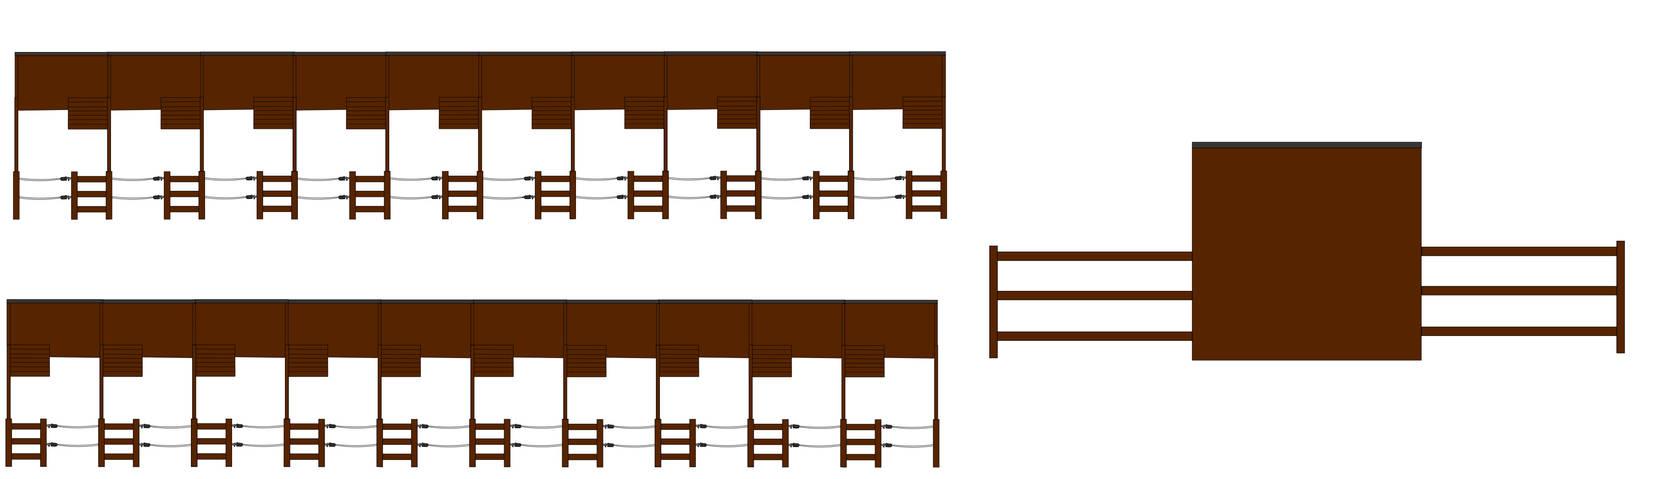 Paddockboxe's Open (with 20 Boxe's)